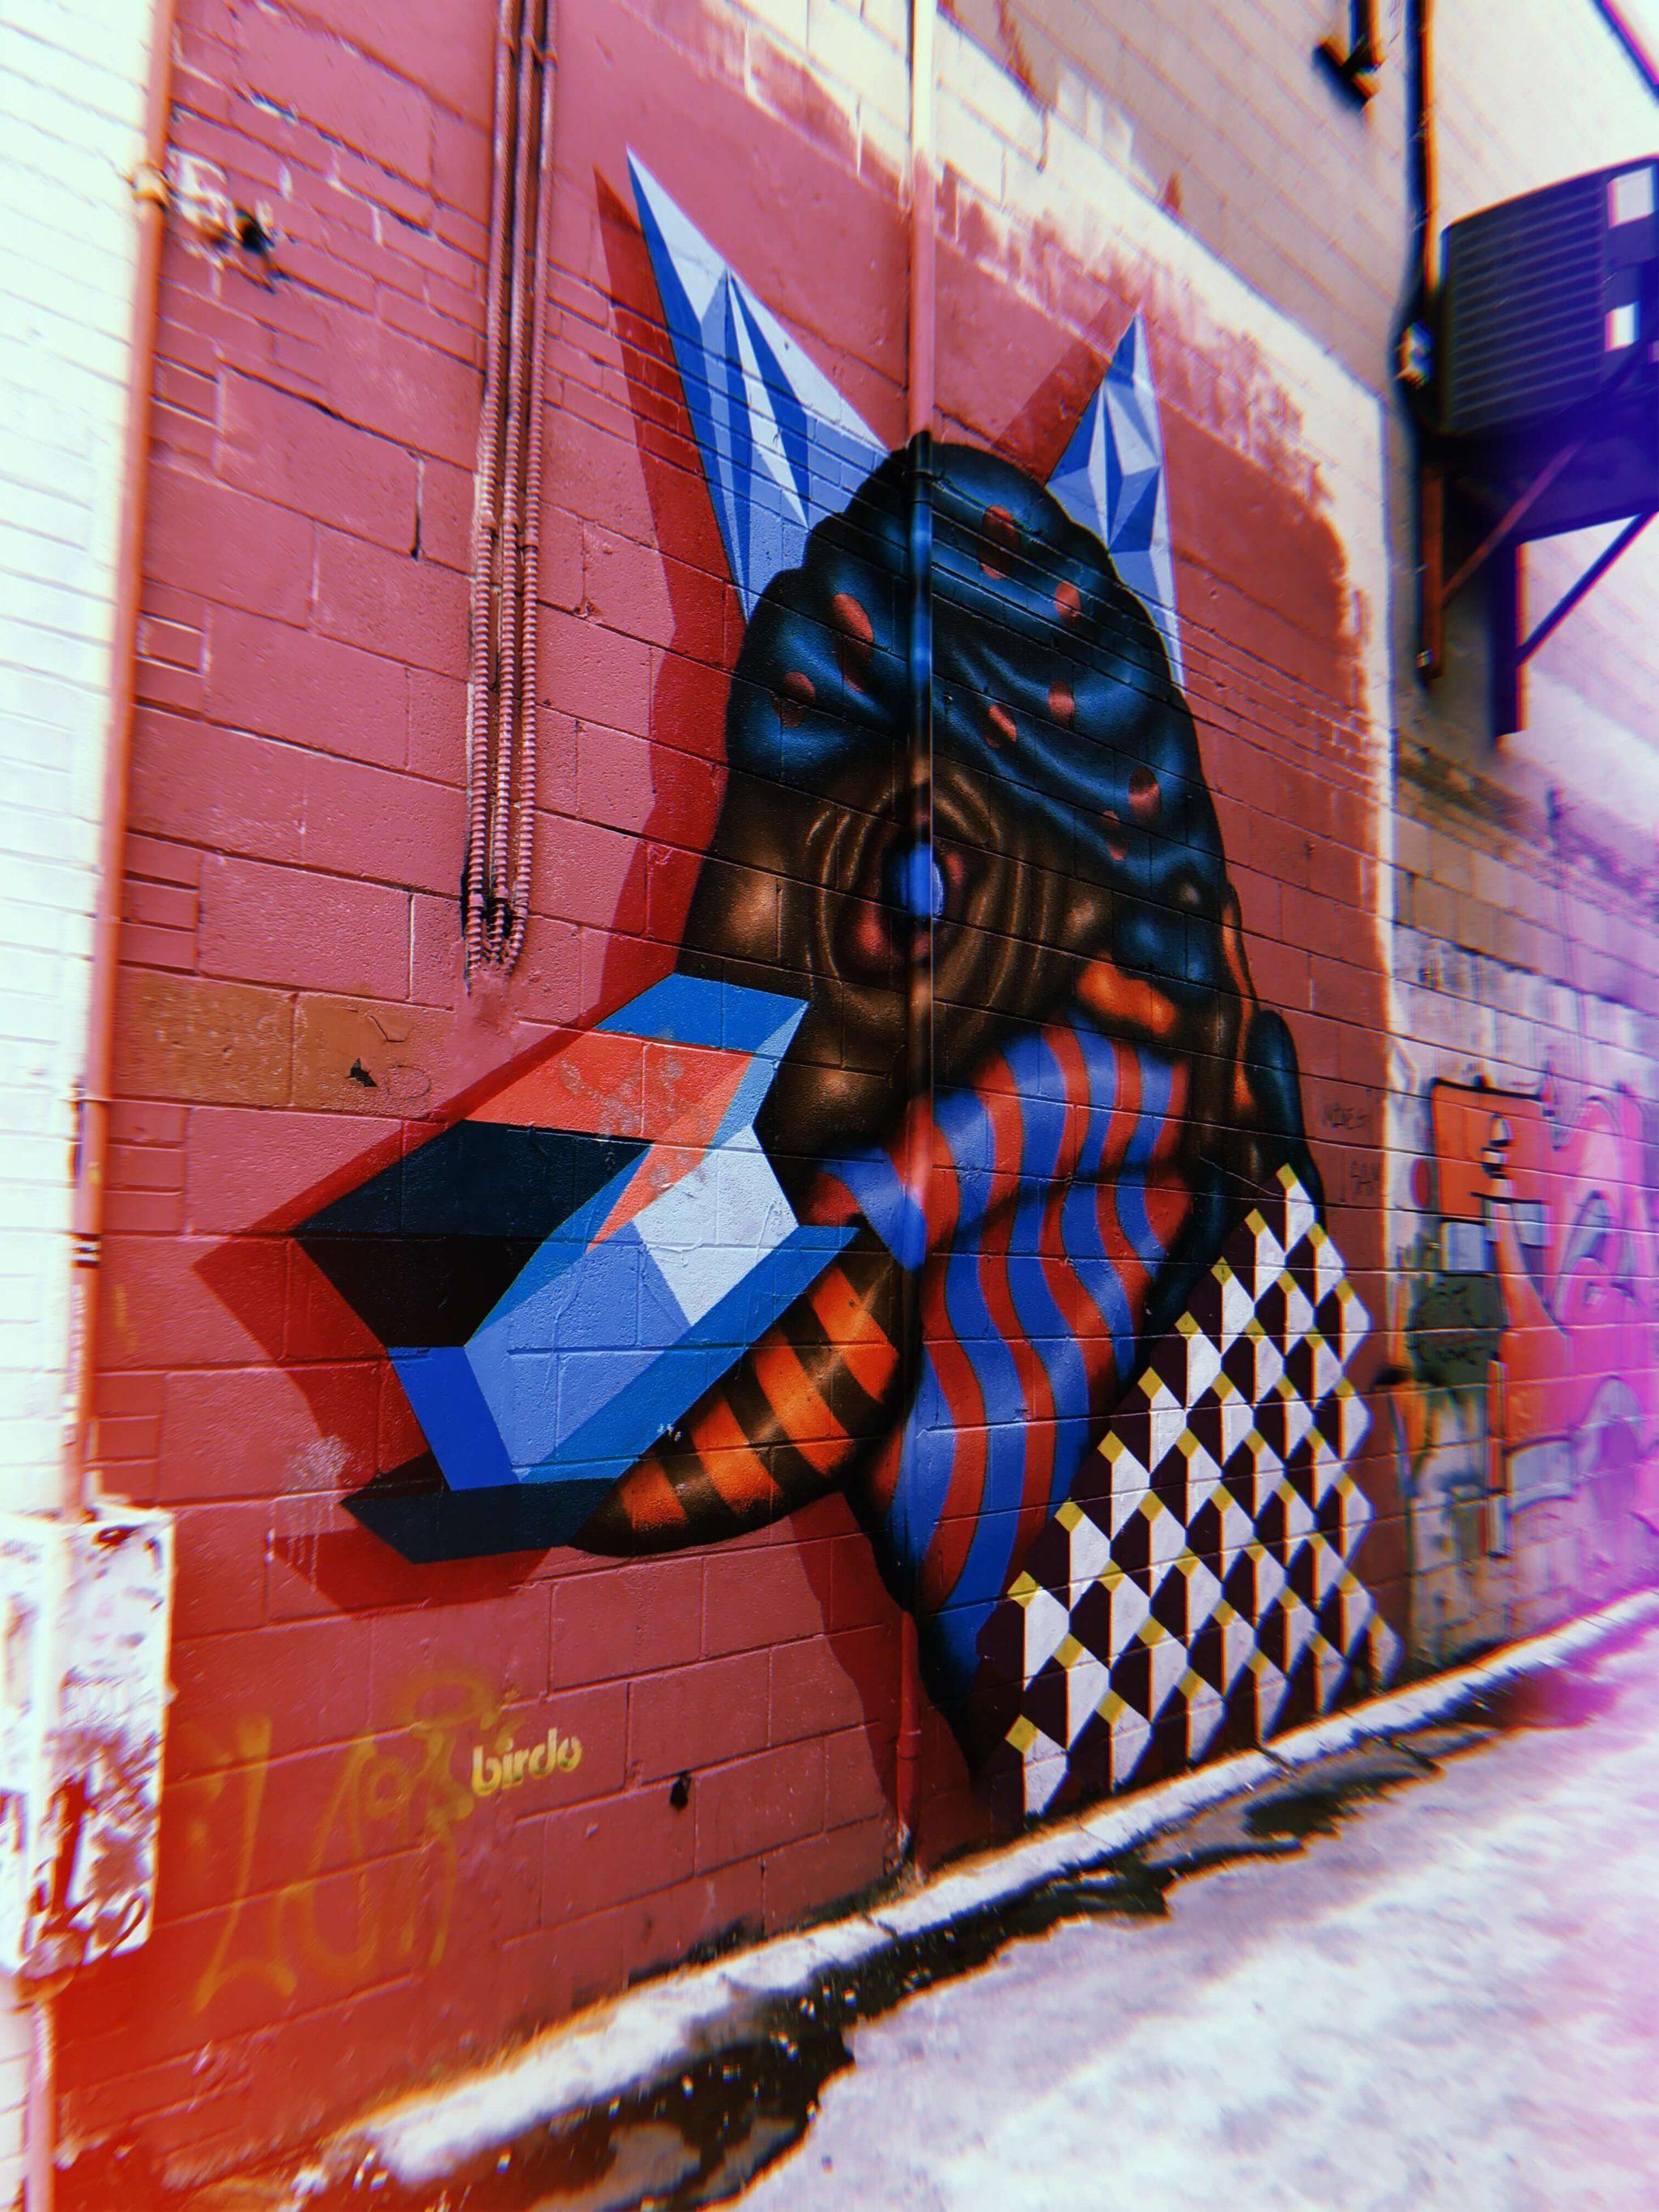 Things to do in Kensington Market Toronto - street art